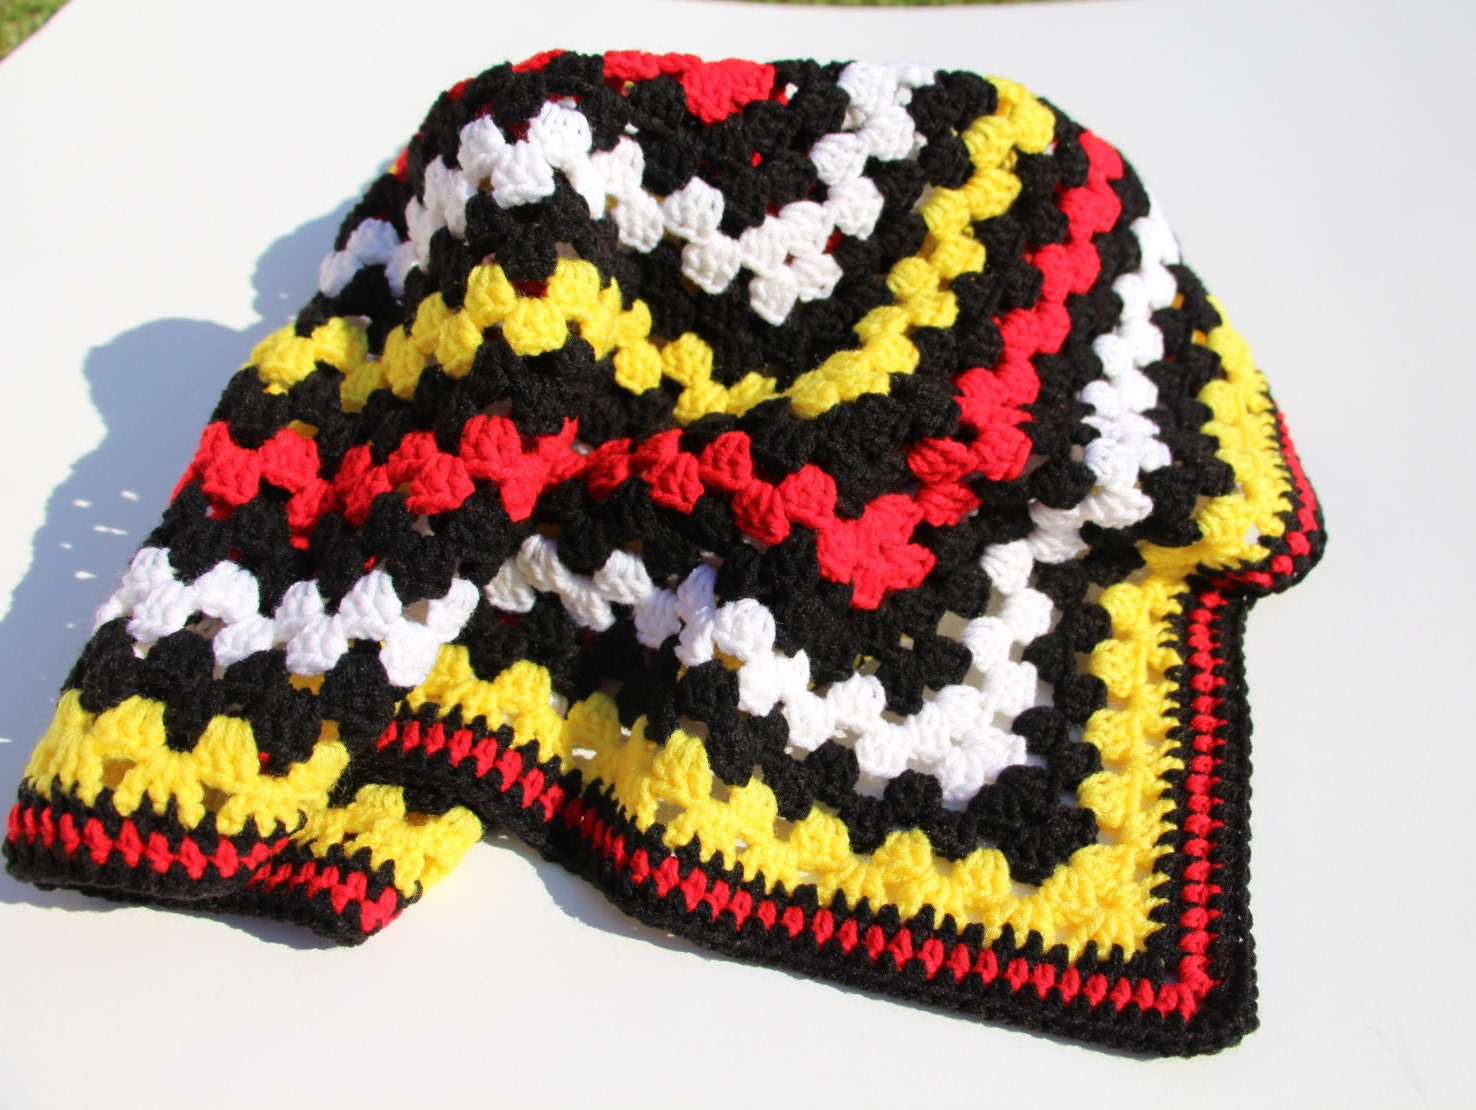 Mickey Mouse Crochet Baby Blanket Pattern : Mickey Mouse Blanket Crochet Baby Blanket Handmade Blanket